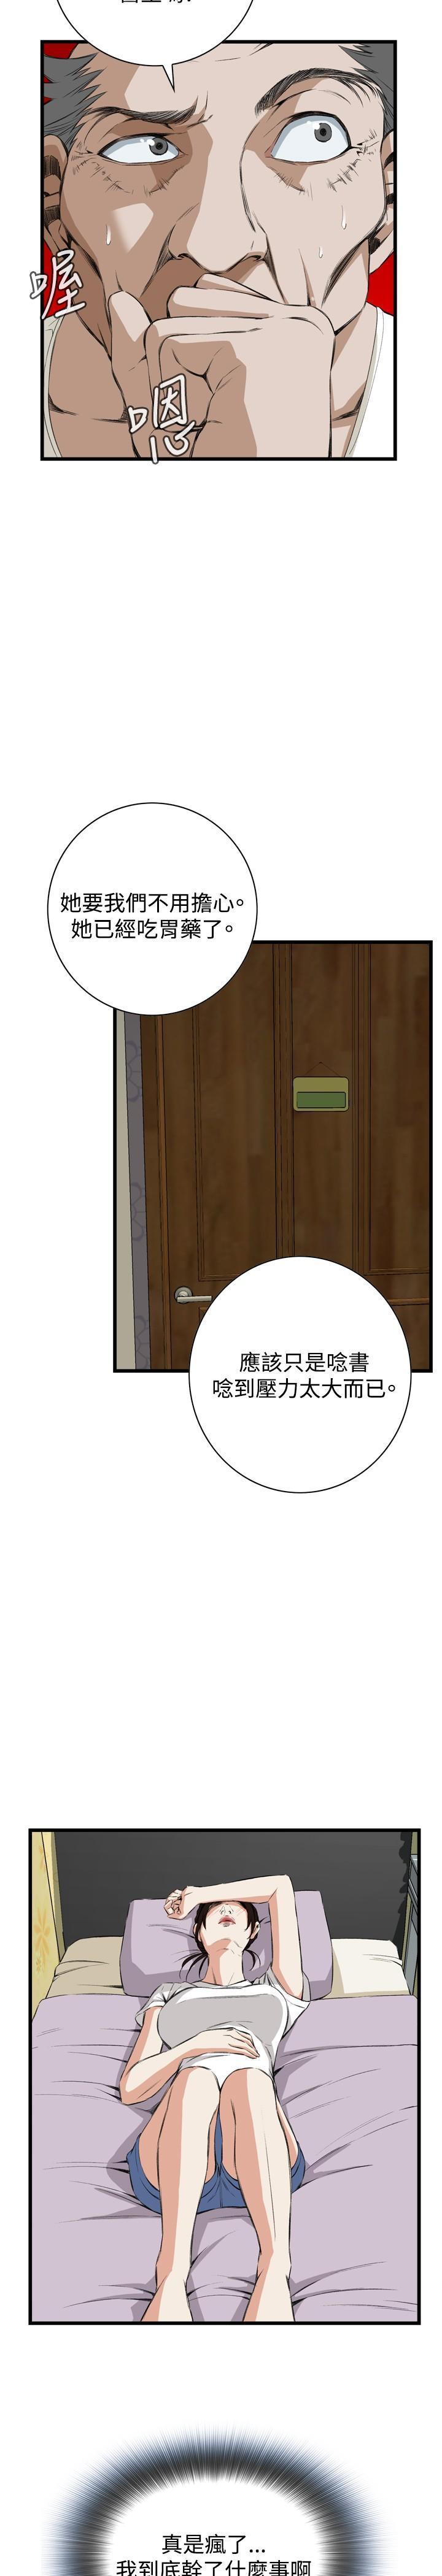 Take a Peek 偷窥 Ch.39~60 [Chinese]中文 385